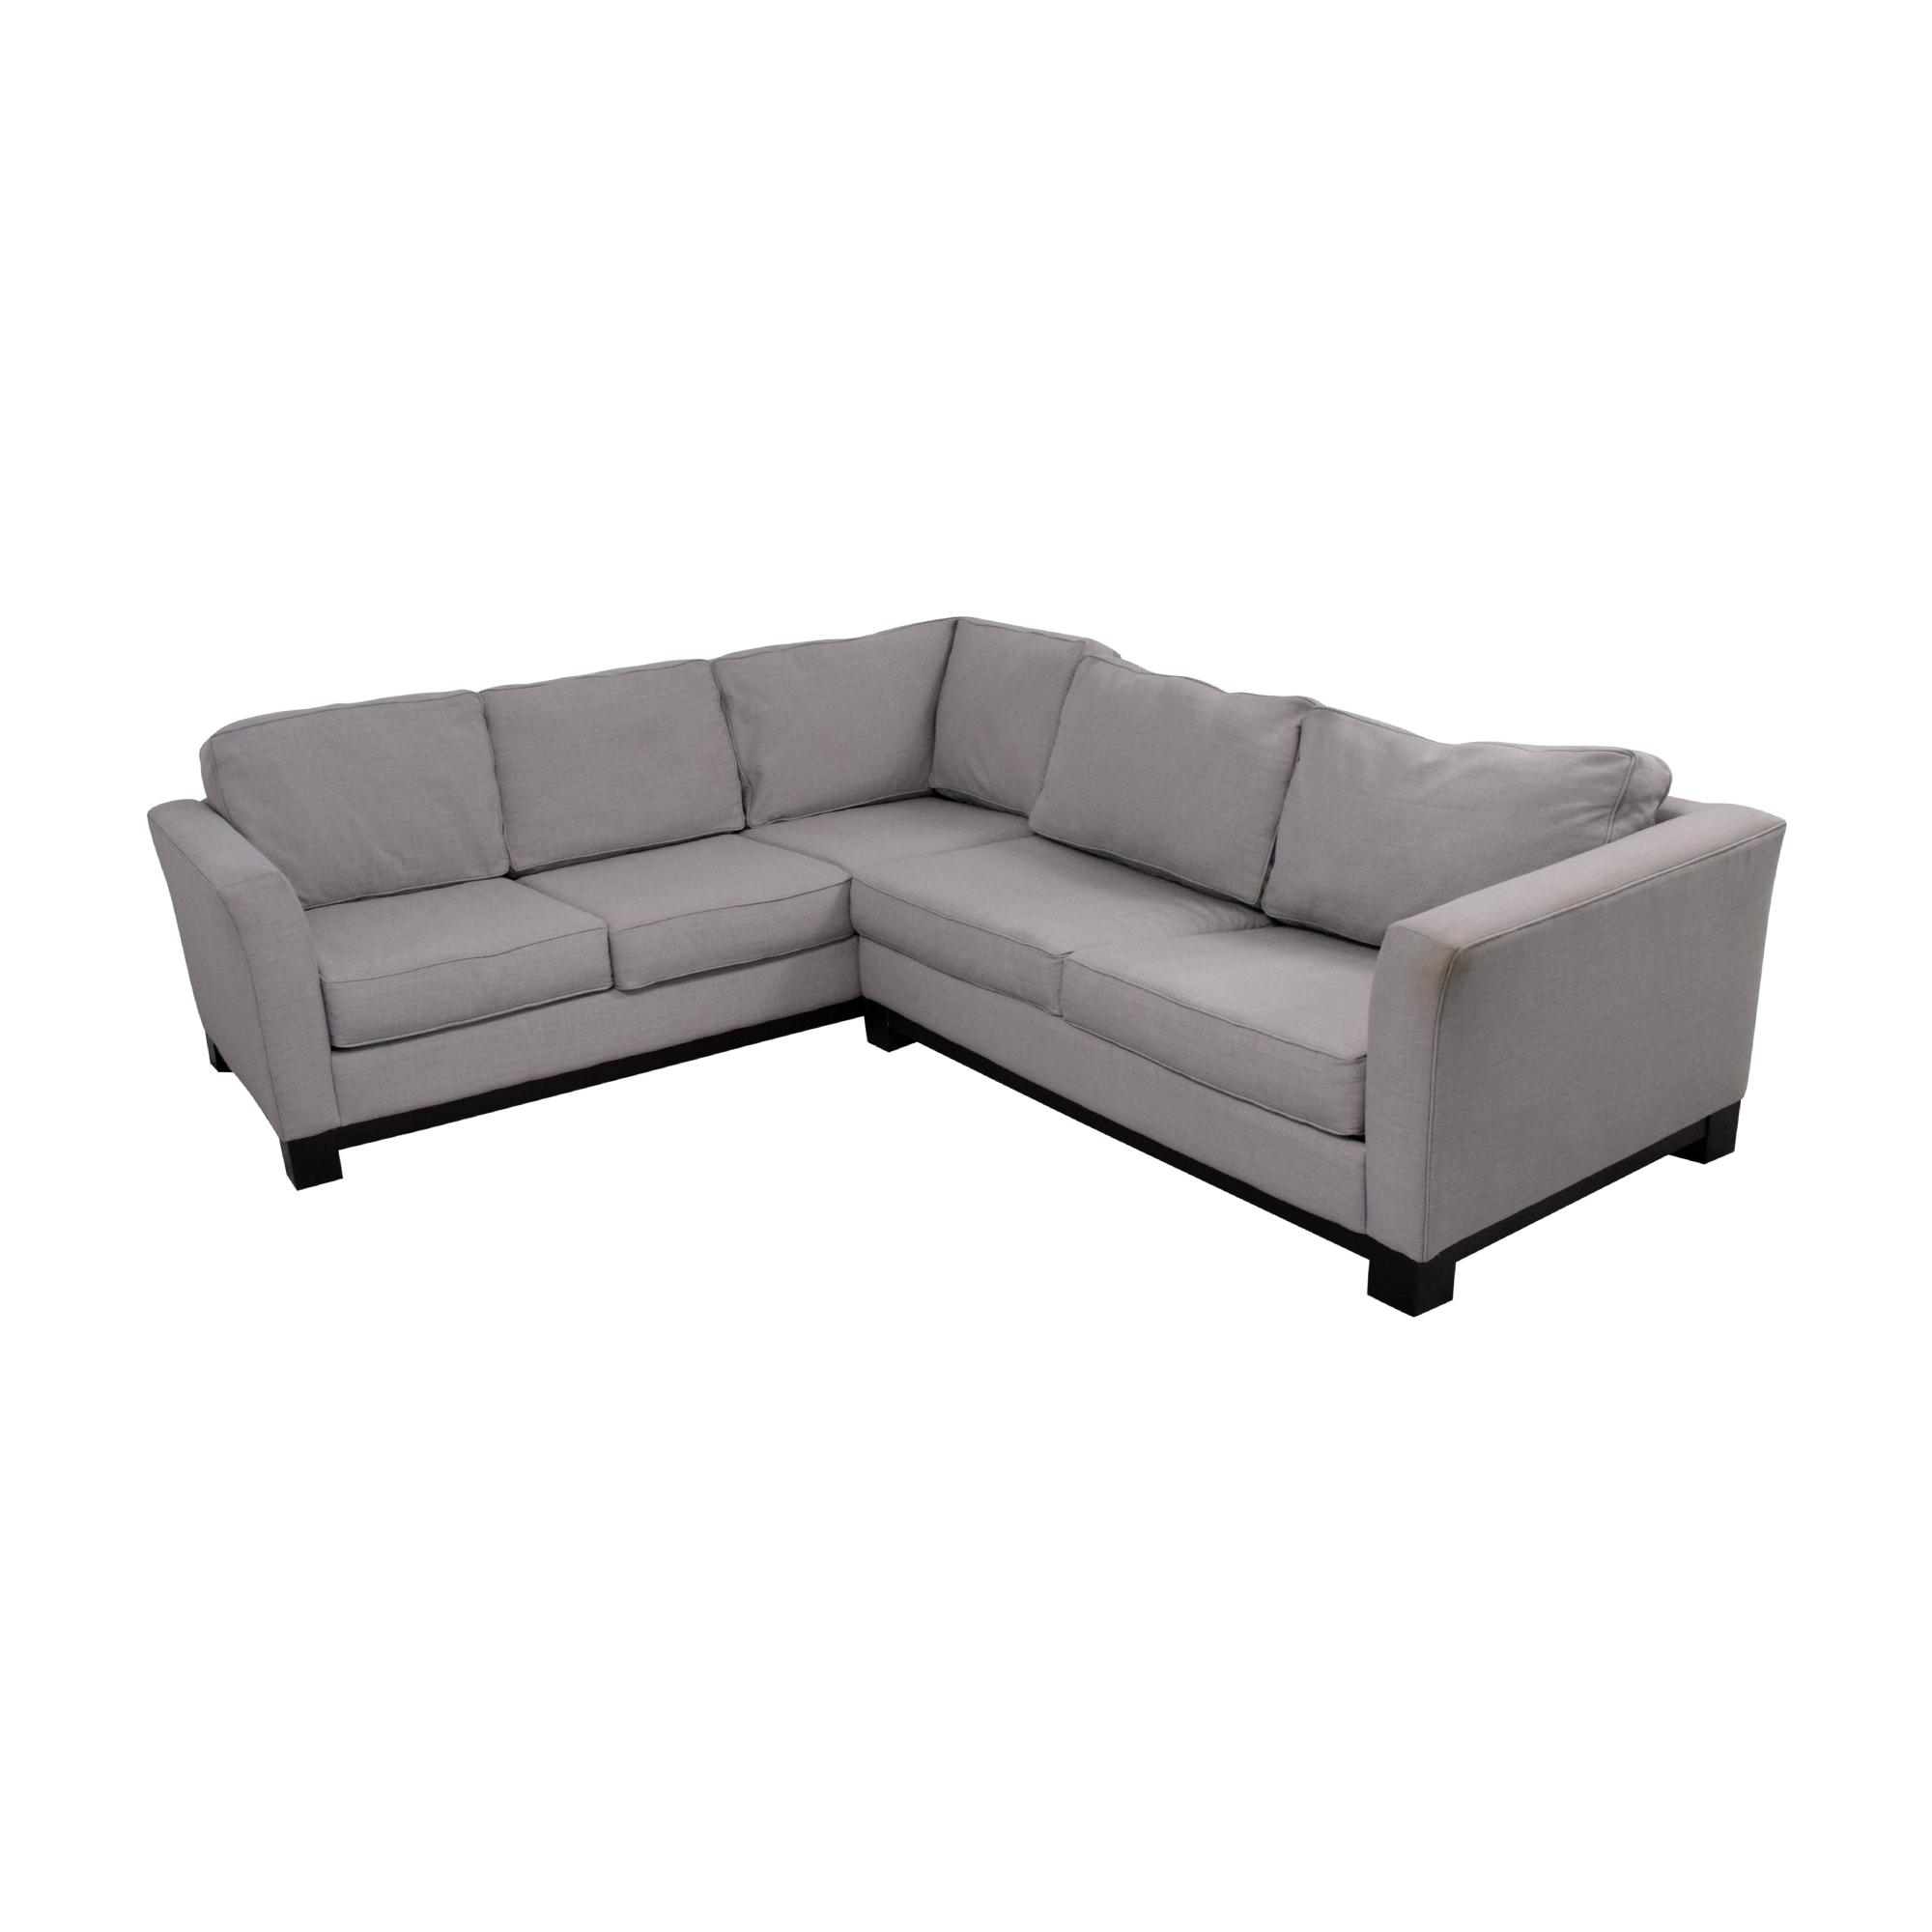 shop Macy's Elliot 2pc Sleeper Sofa Sectional Macy's Sectionals